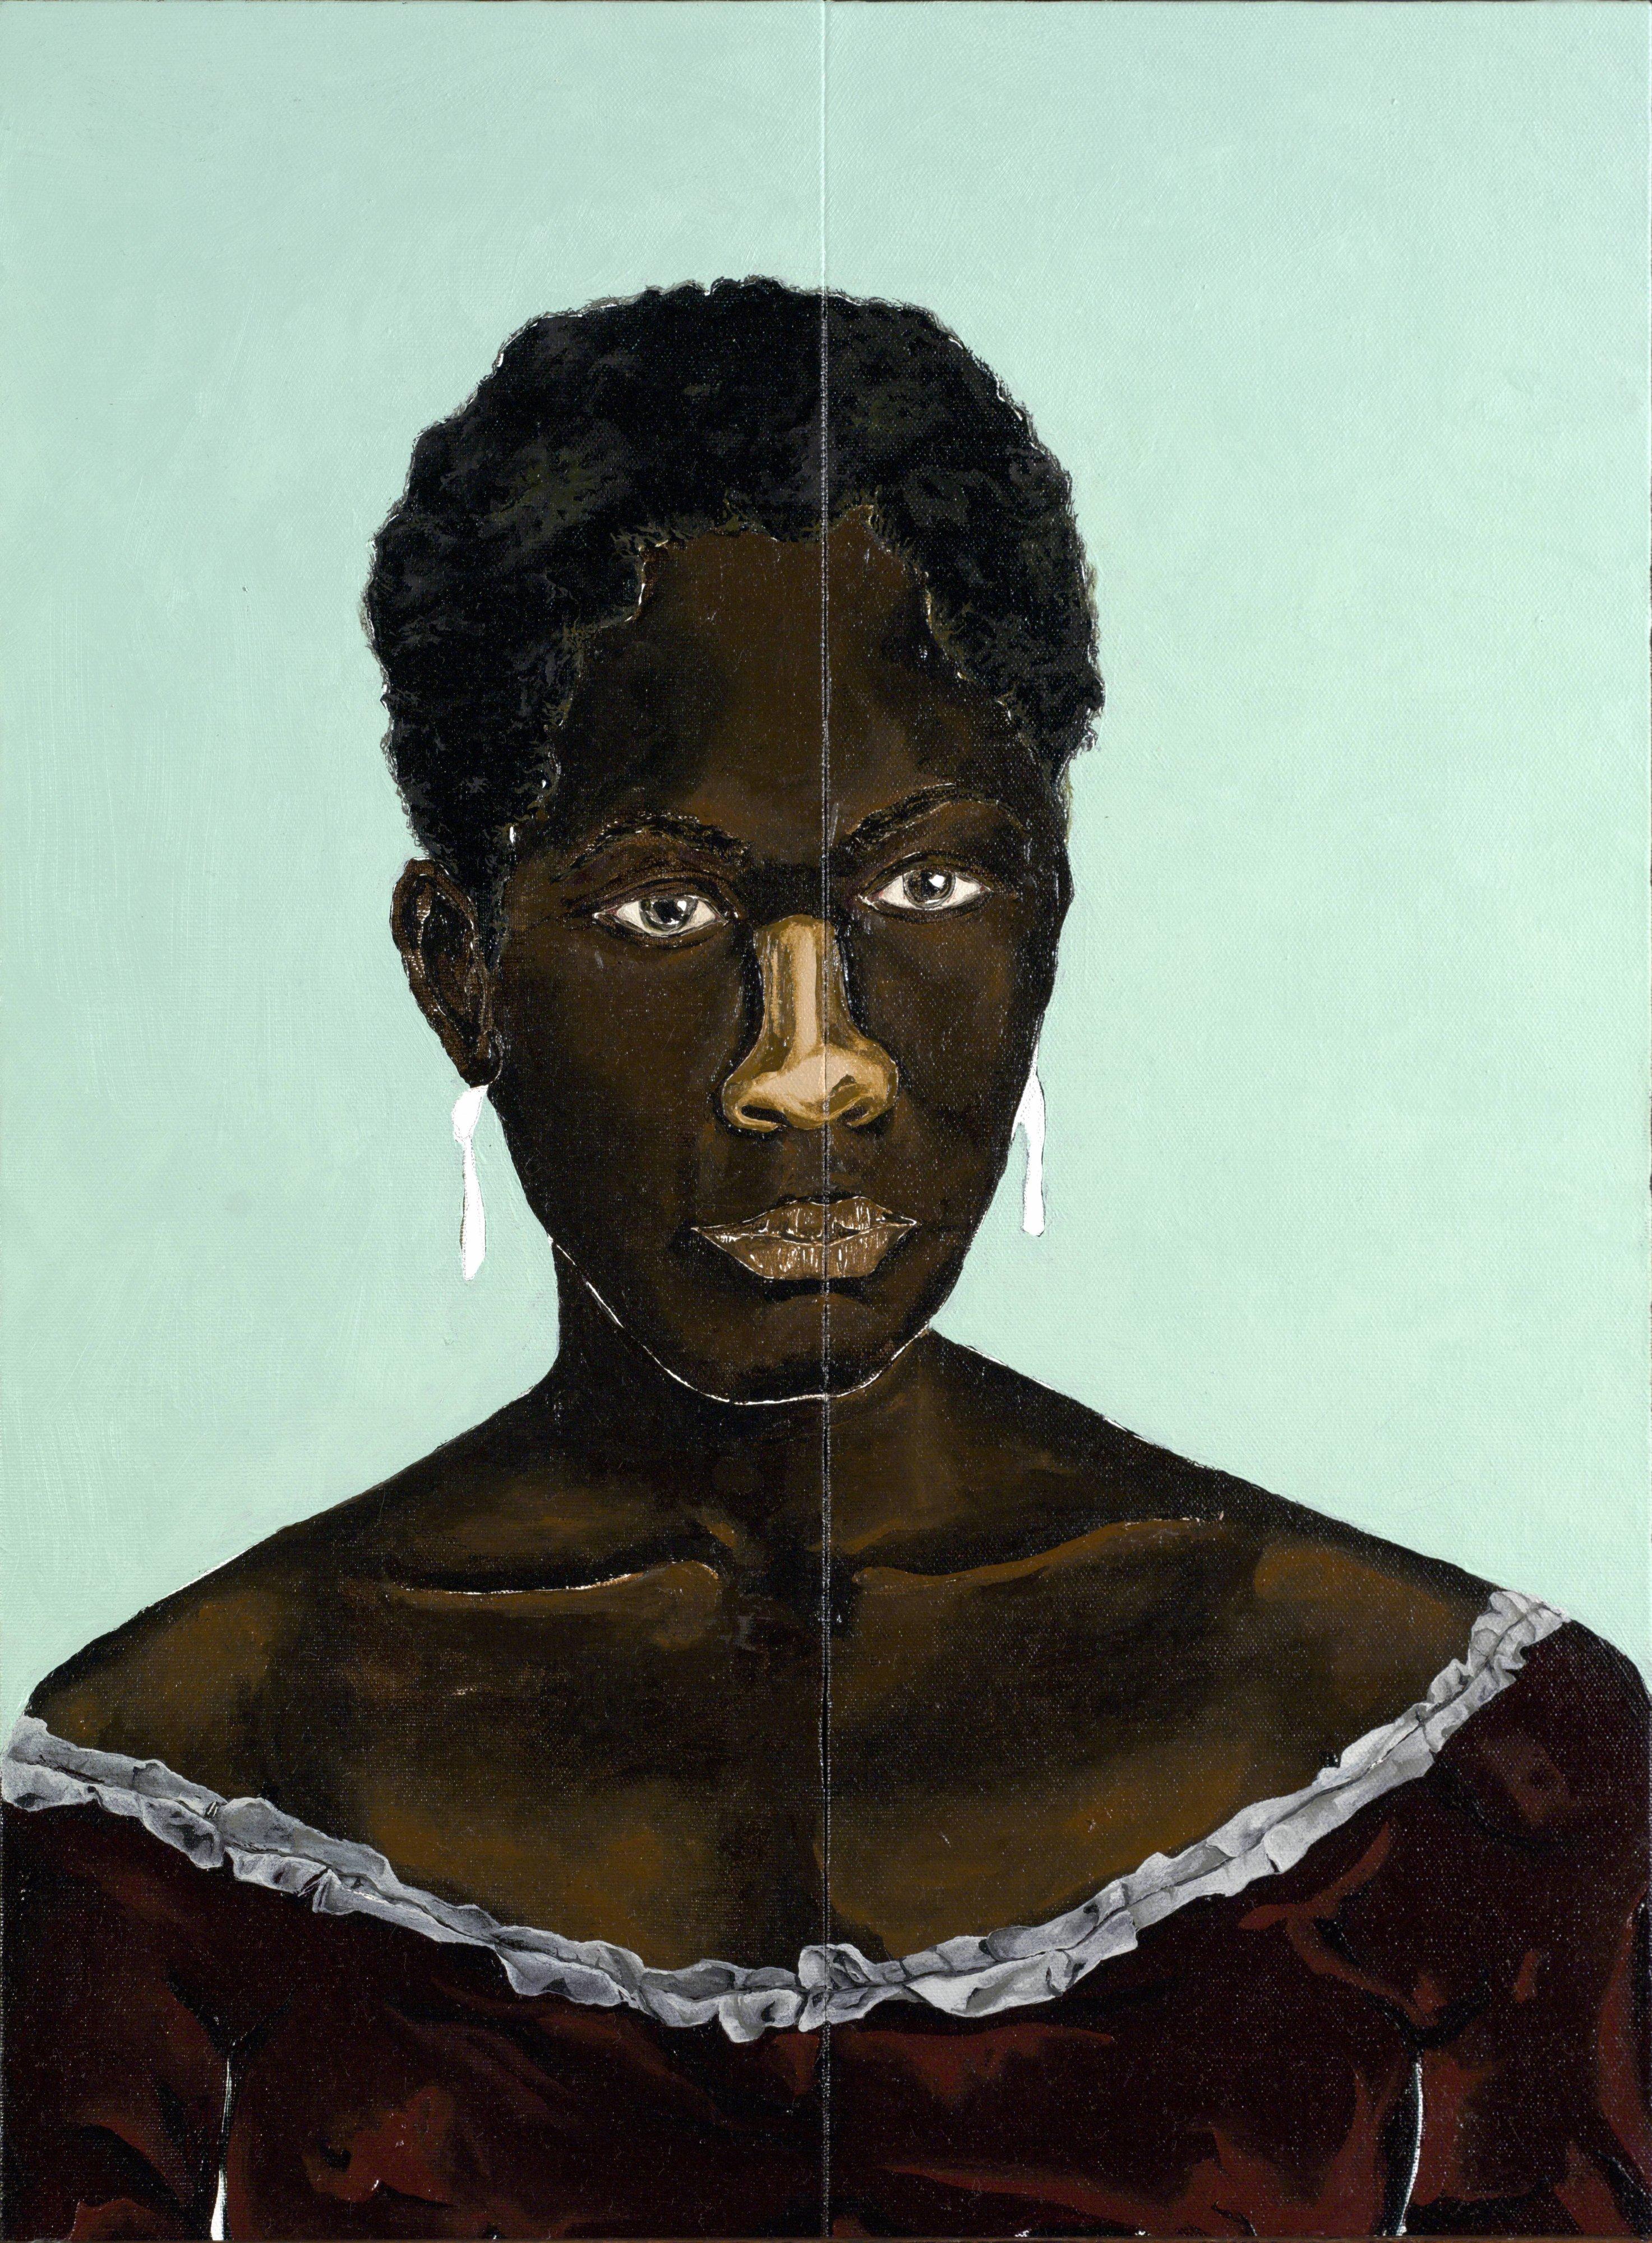 Dalton Paula's Zeferina, 2018. Image courtesy of National Gallery of Art.